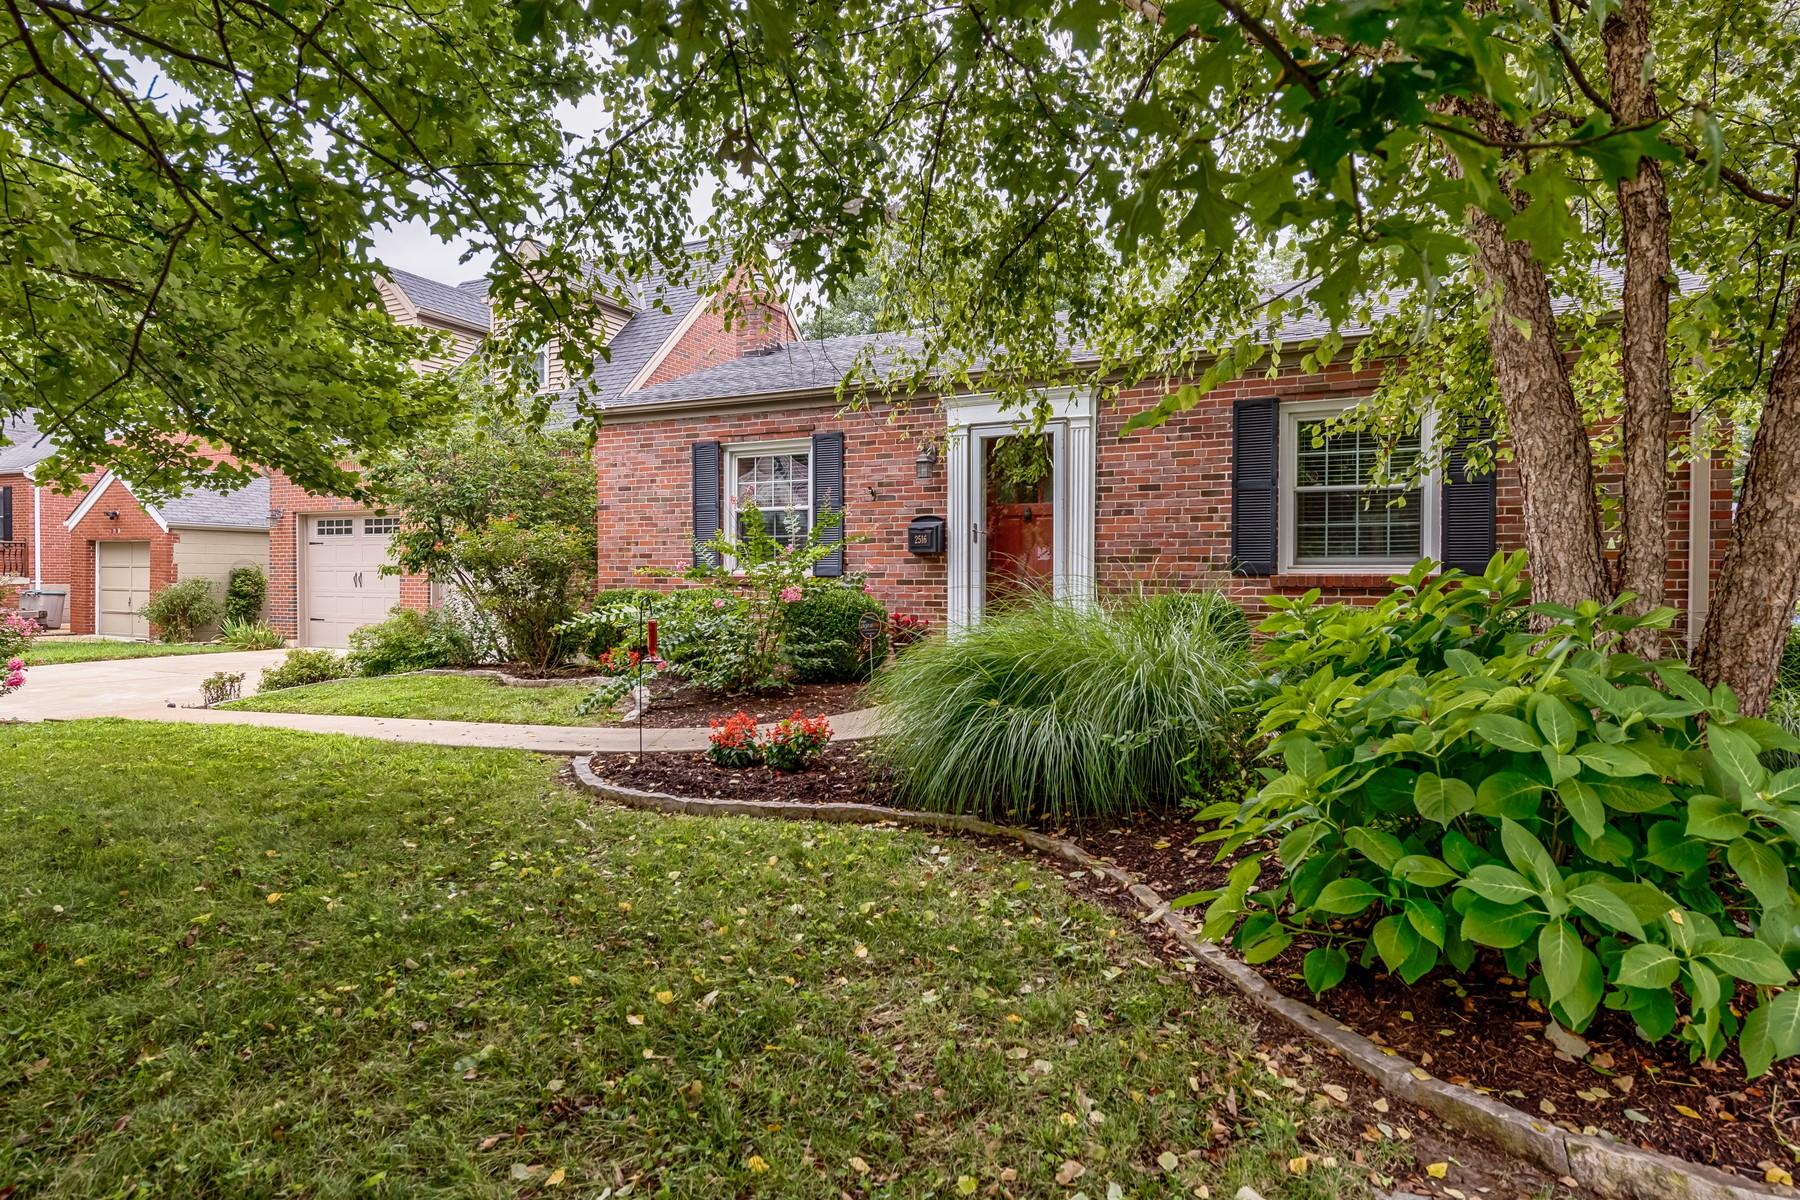 Single Family Home for Sale at 2516 Remington Lane St. Louis, Missouri 63144 United States